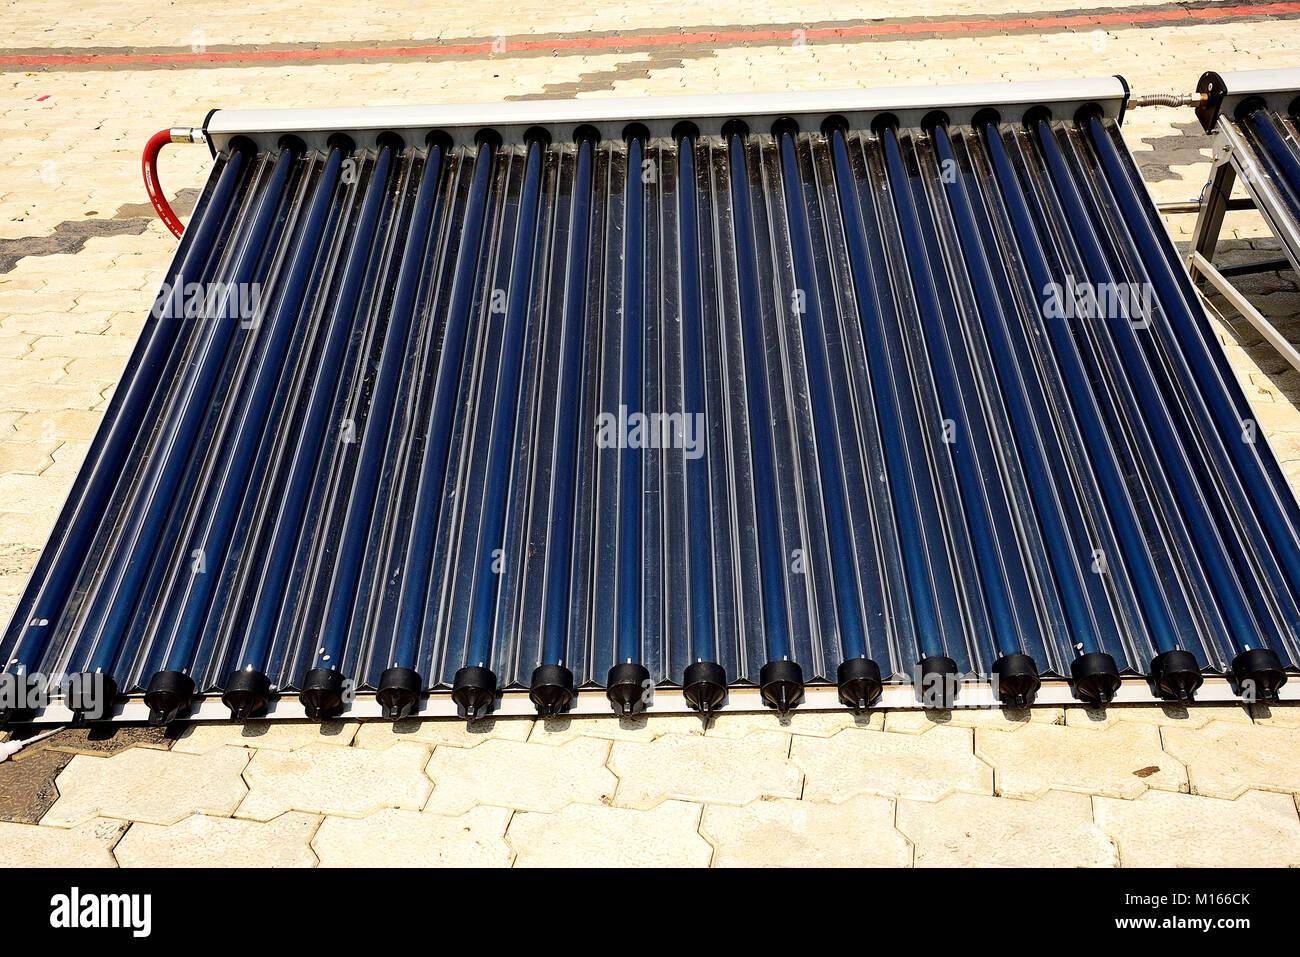 Solar Water Heater - Stock Image